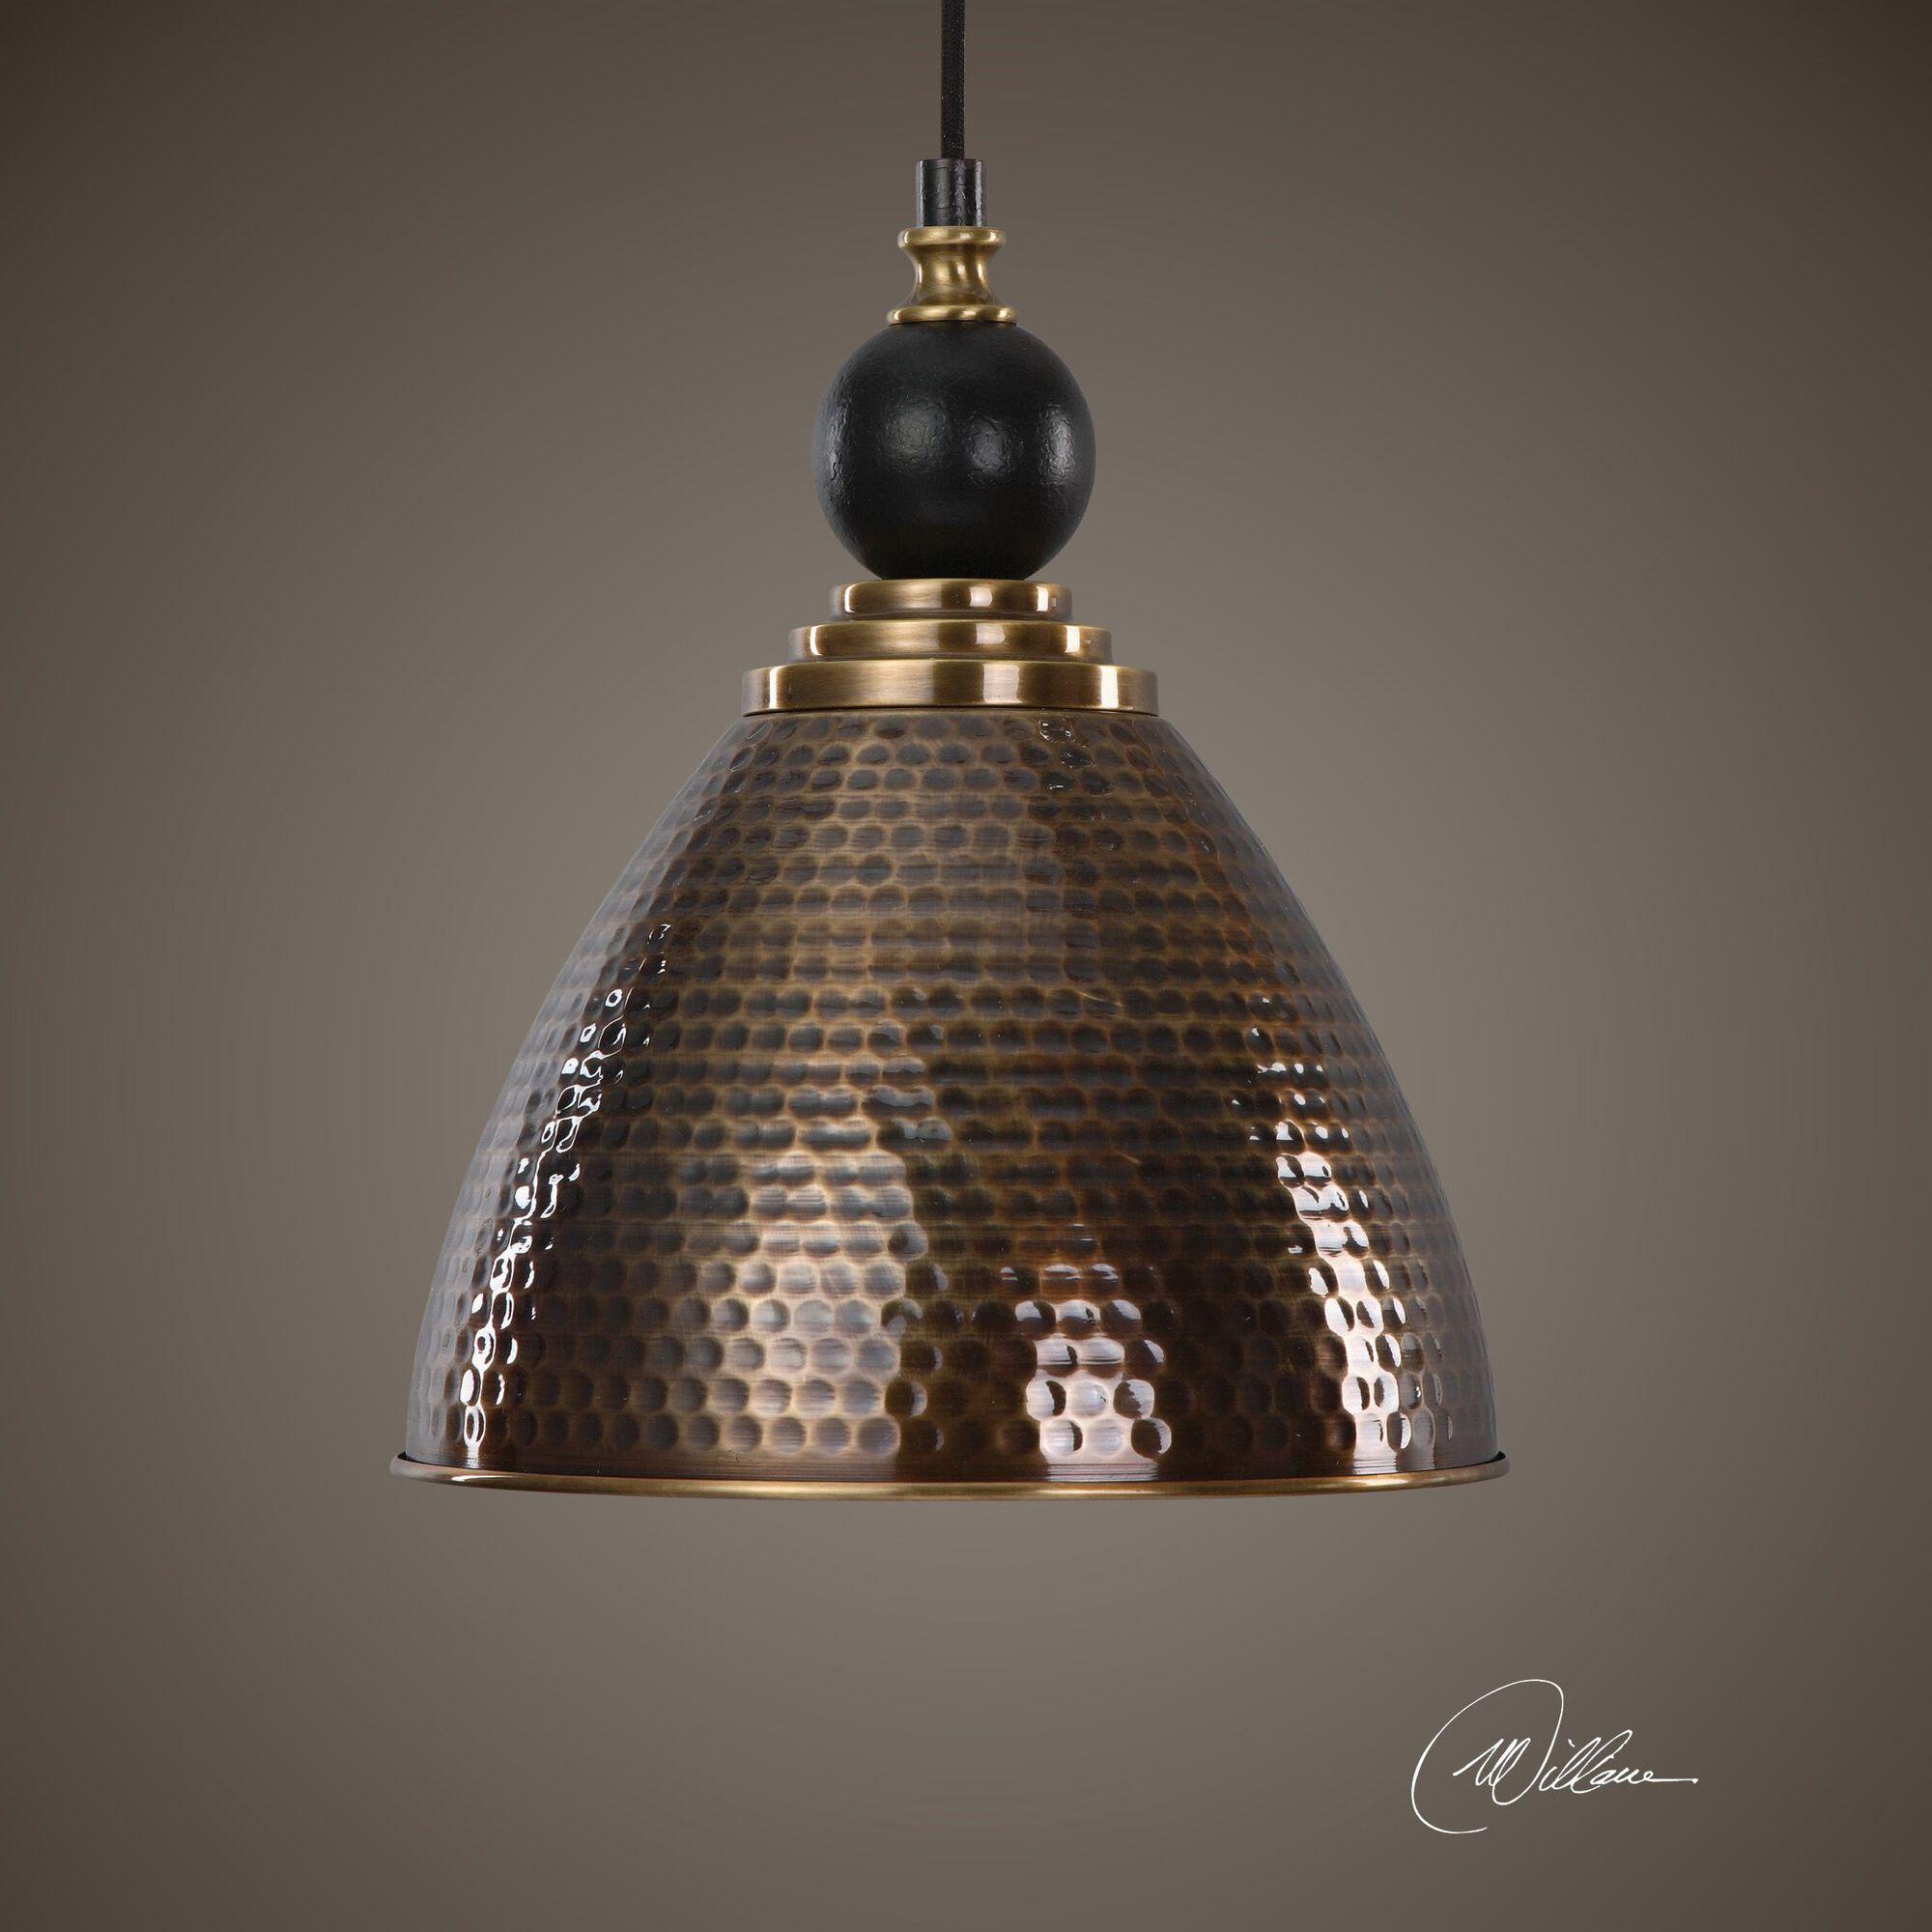 Honeycomb Pendant Light: Honeycomb-Textured Single-Bulb Pendant Light In Antique